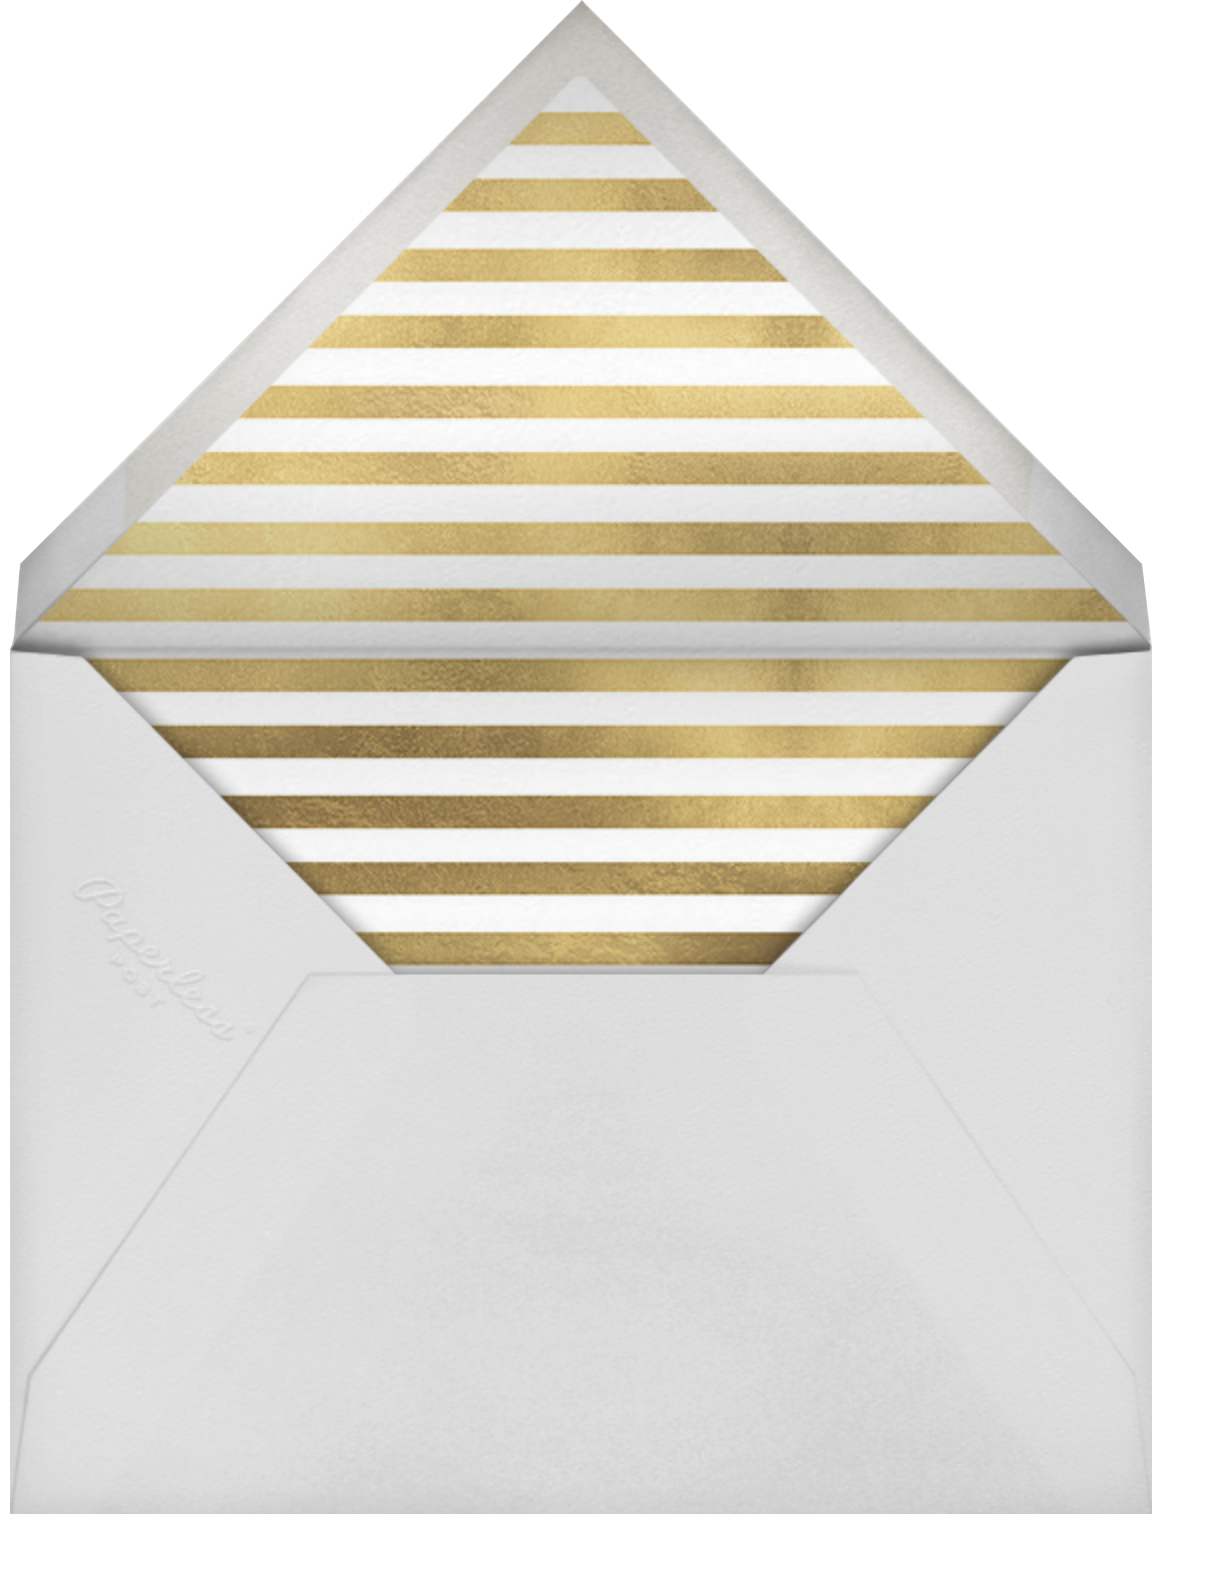 TBT Grad - Cheree Berry Paper & Design - Graduation cards - envelope back